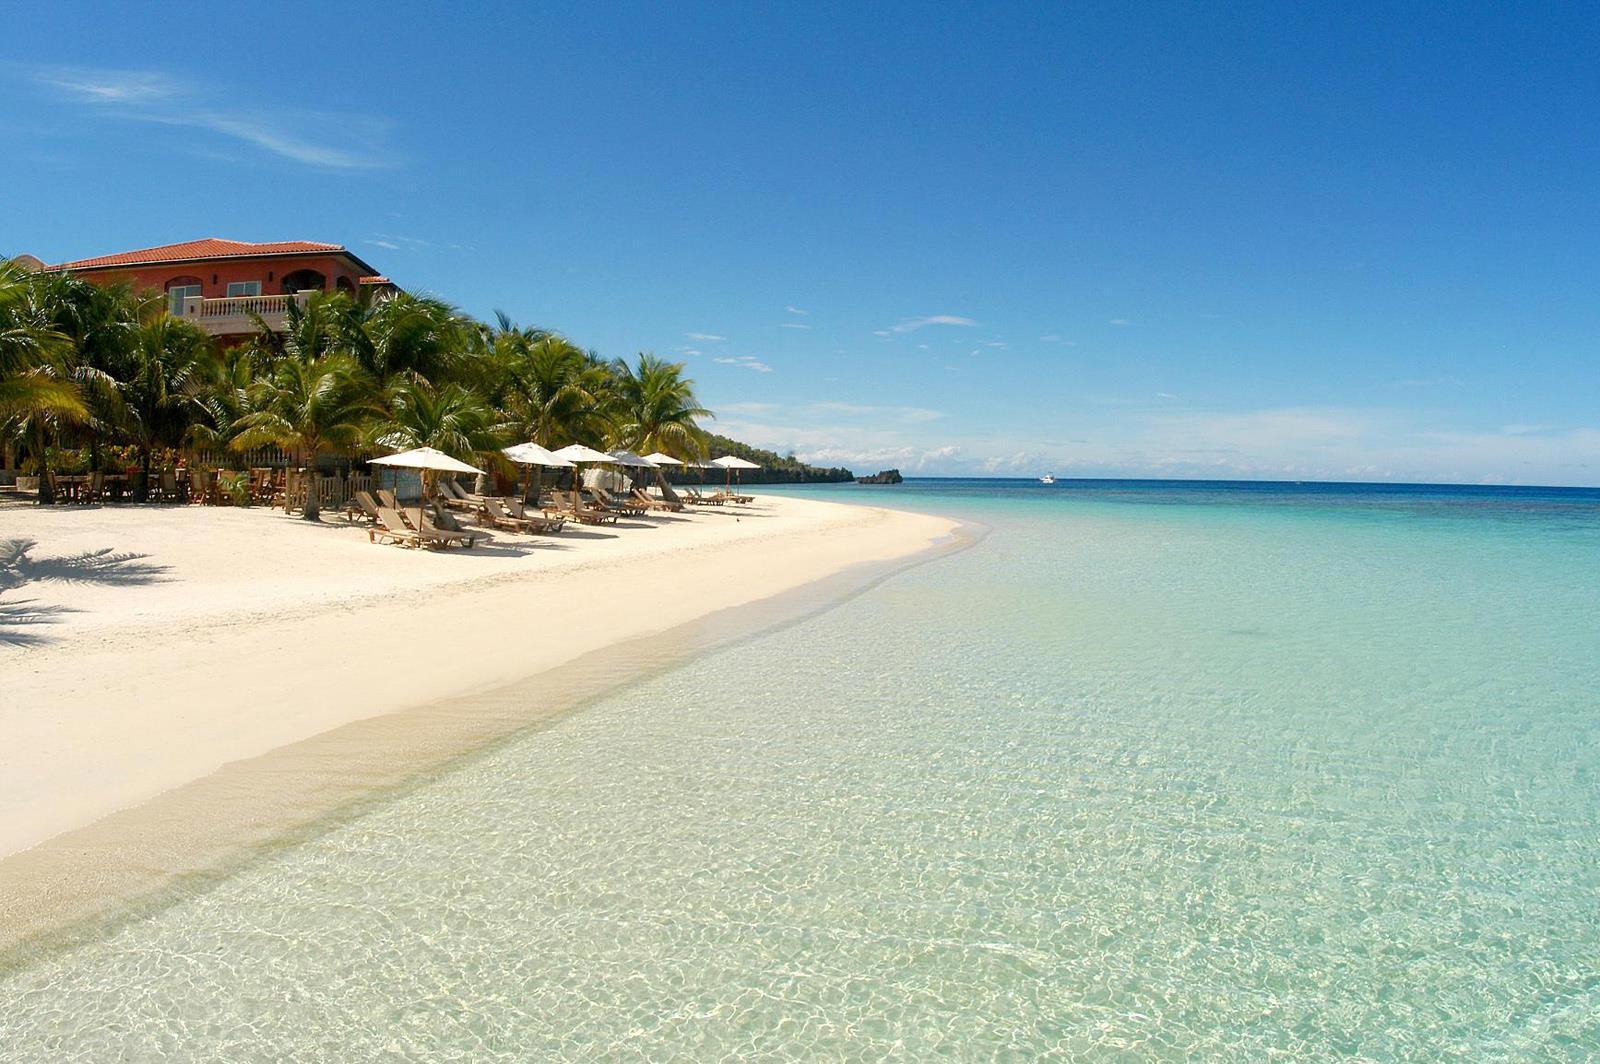 Paradijselijk strand: De 15 mooiste stranden ter wereld!